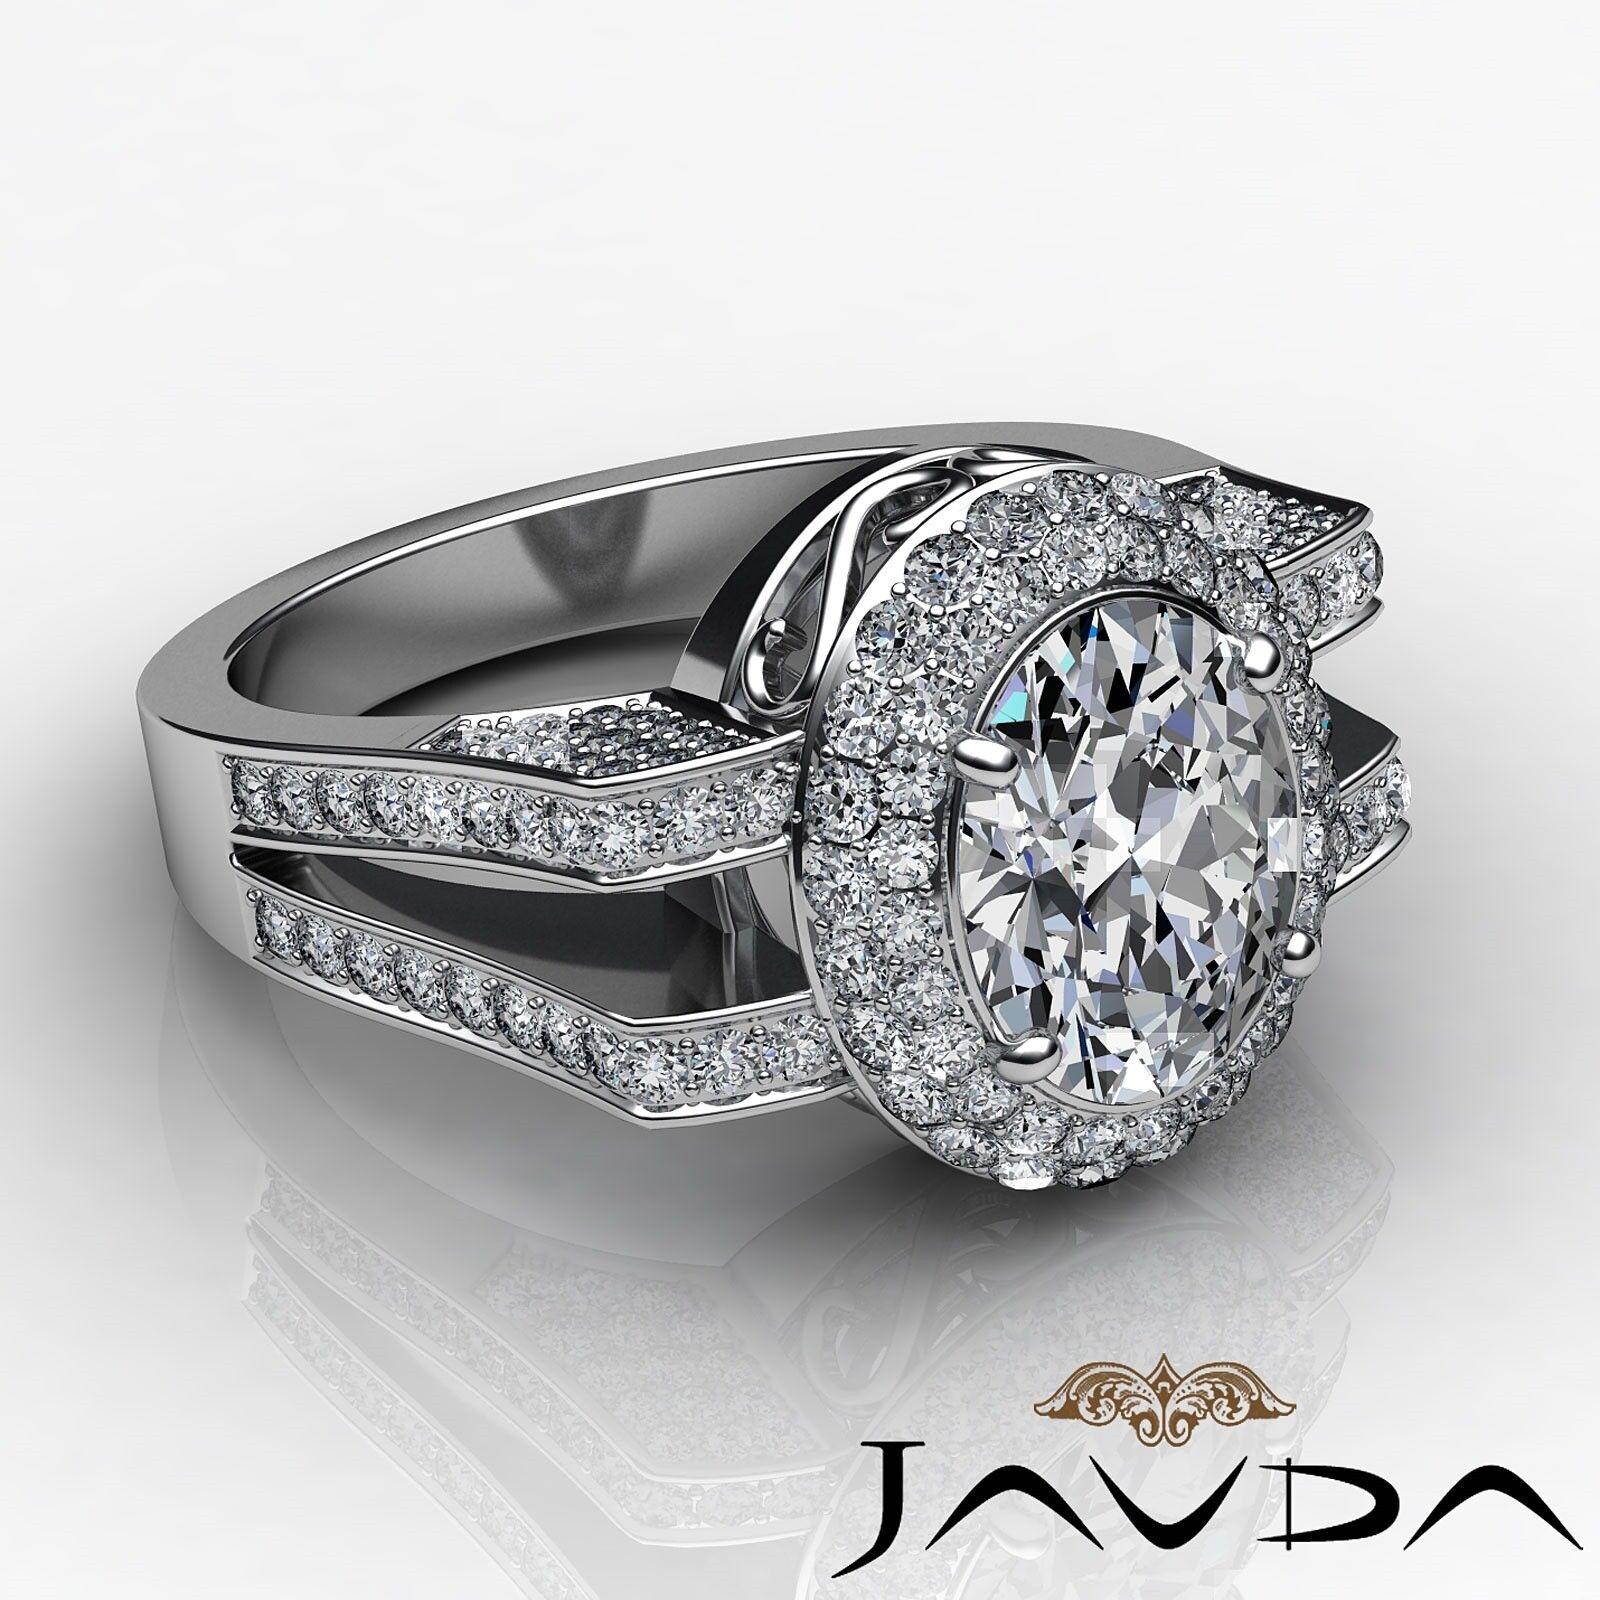 1.9ctw Gala Halo Split Shank Oval Diamond Engagement Ring GIA E-VS2 White Gold 2